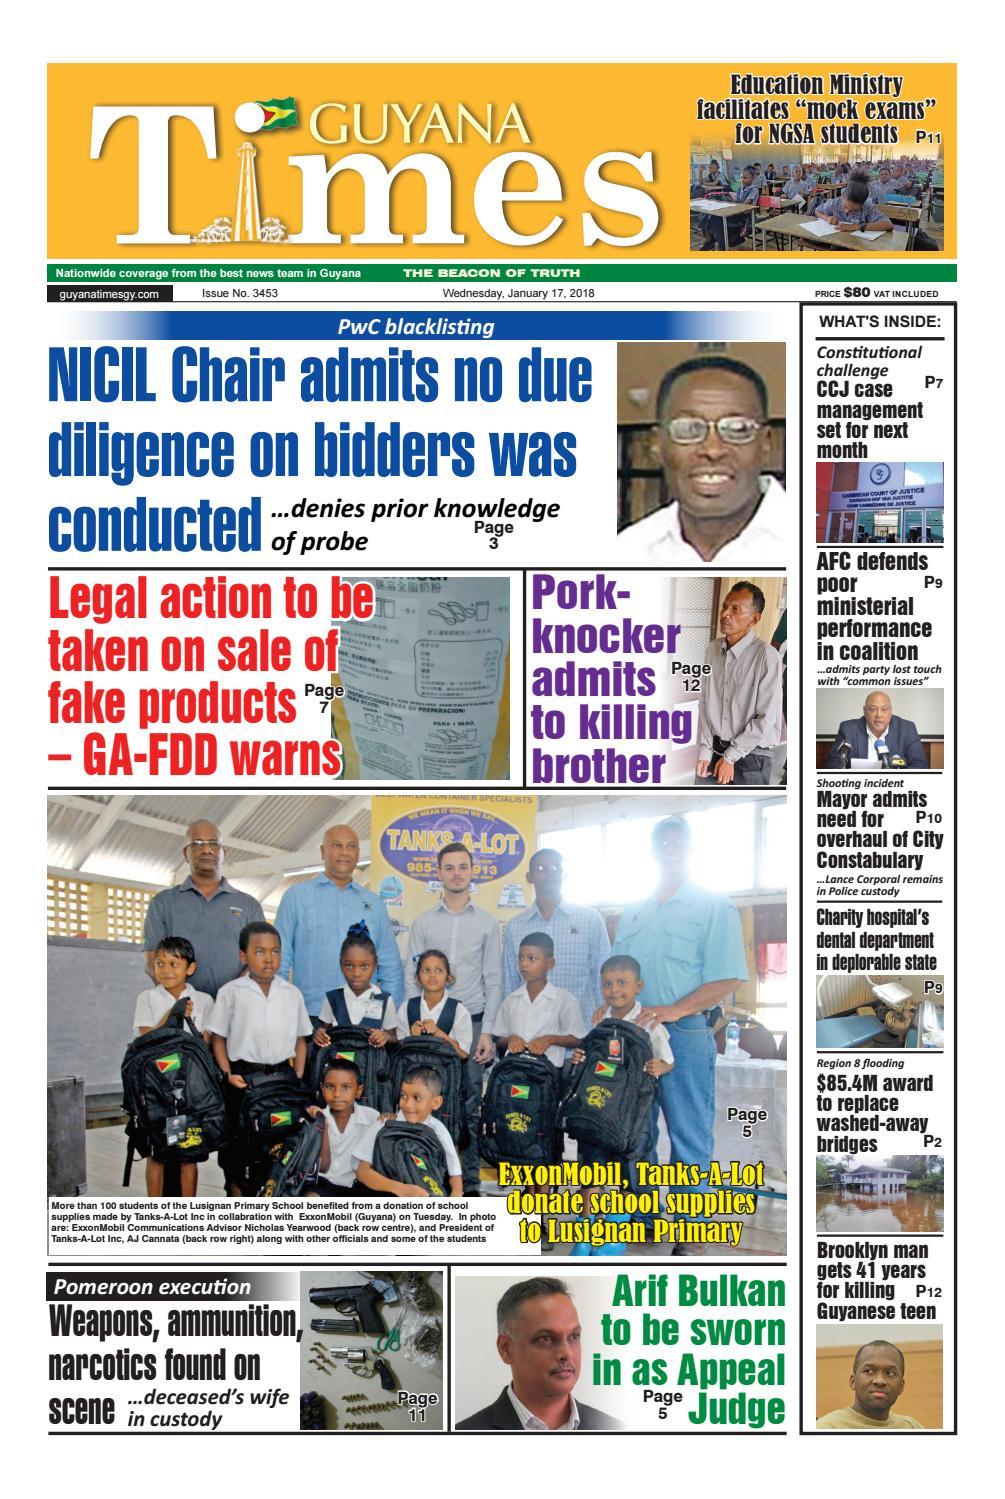 Guyana times 17 january 2018